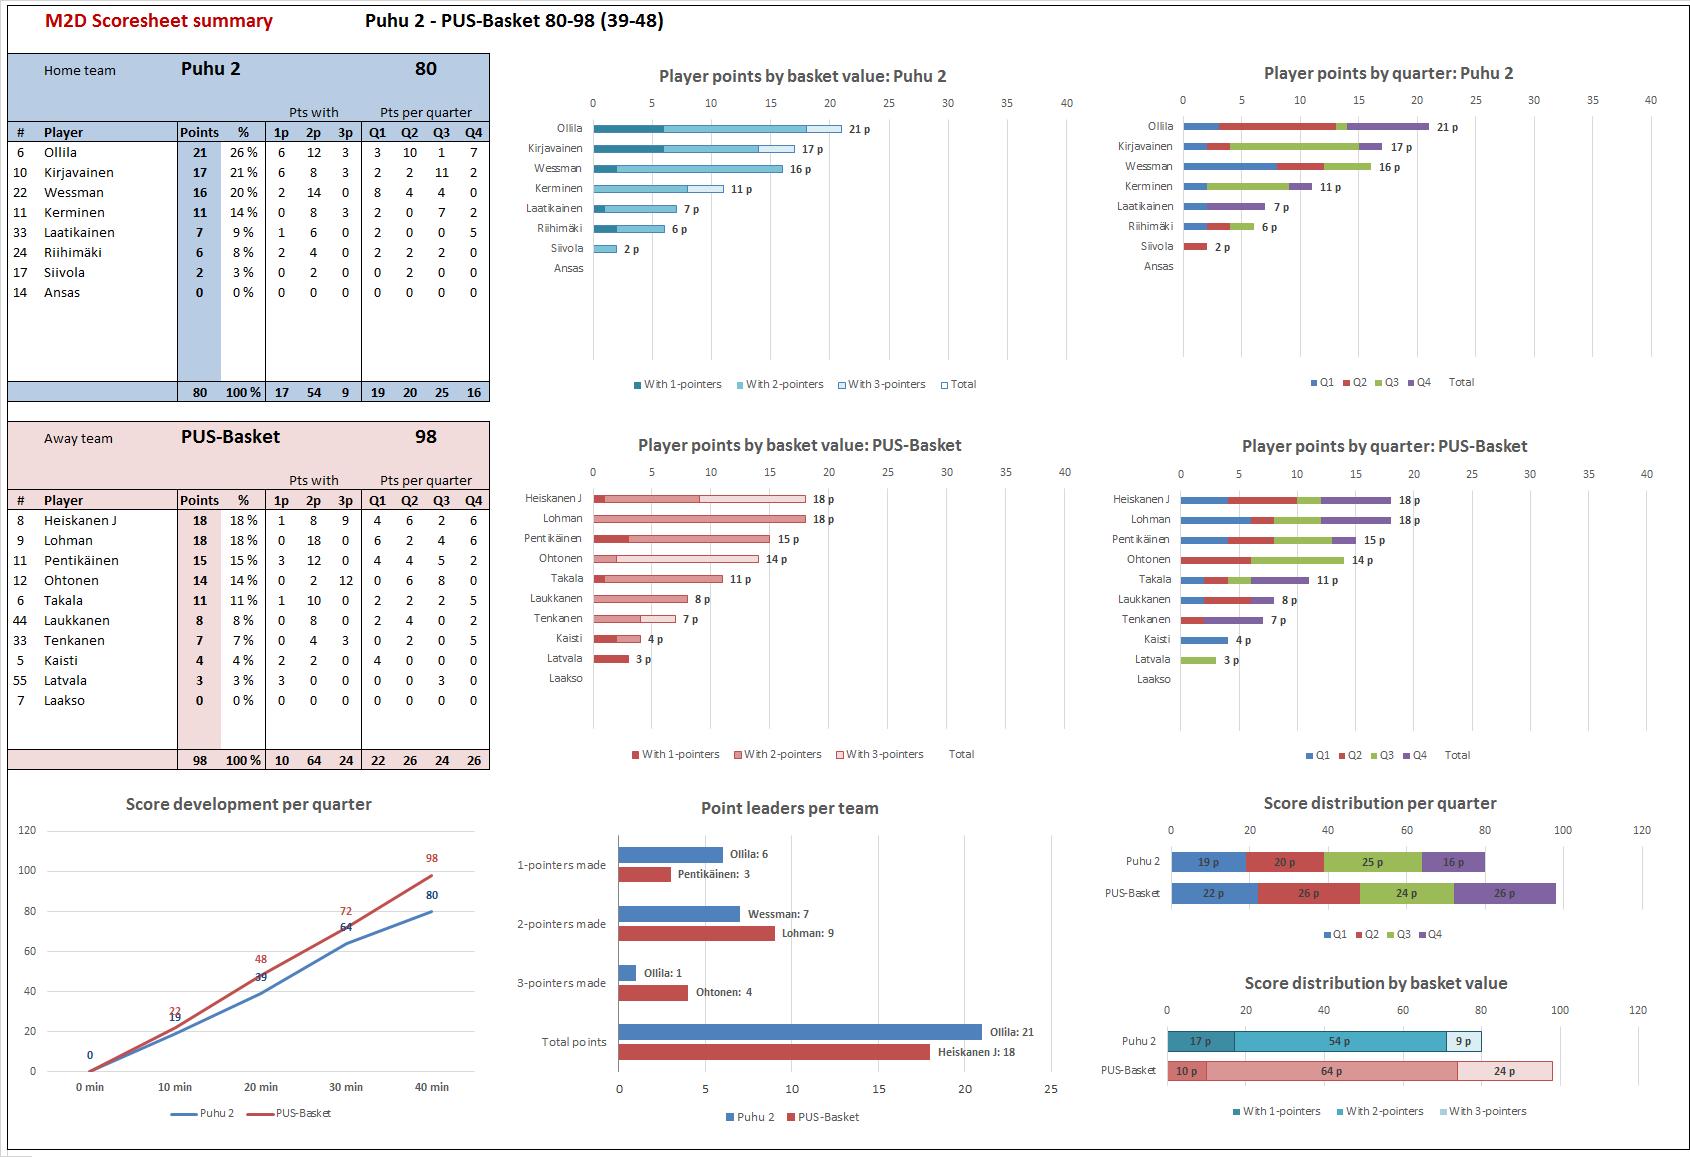 M2D_Scoresheet_2015-11-05_Puhu-PUS